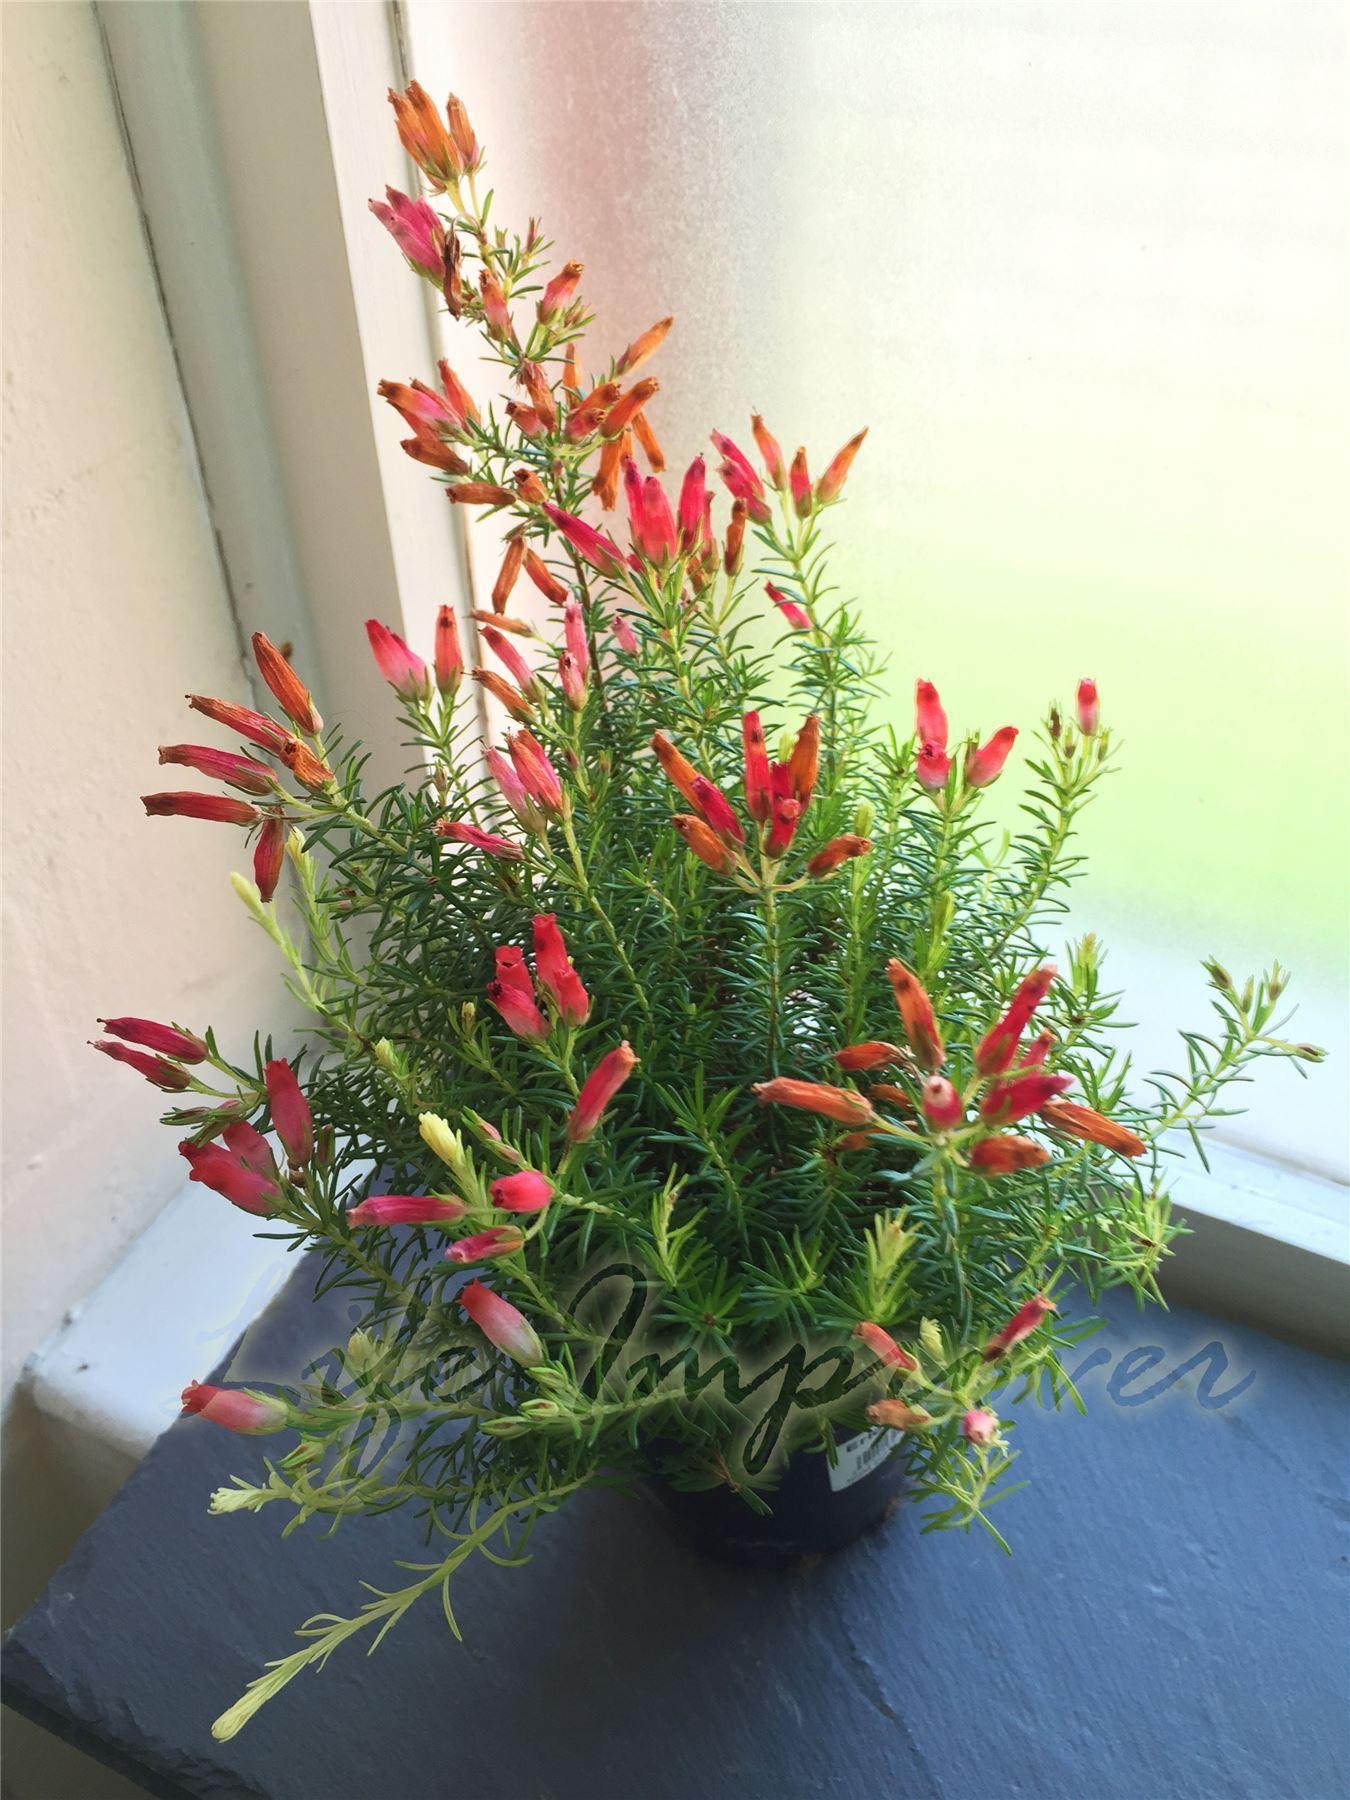 Heath erica oatesii hiver feu hardy evergreen arbuste for Plante pot exterieur hiver